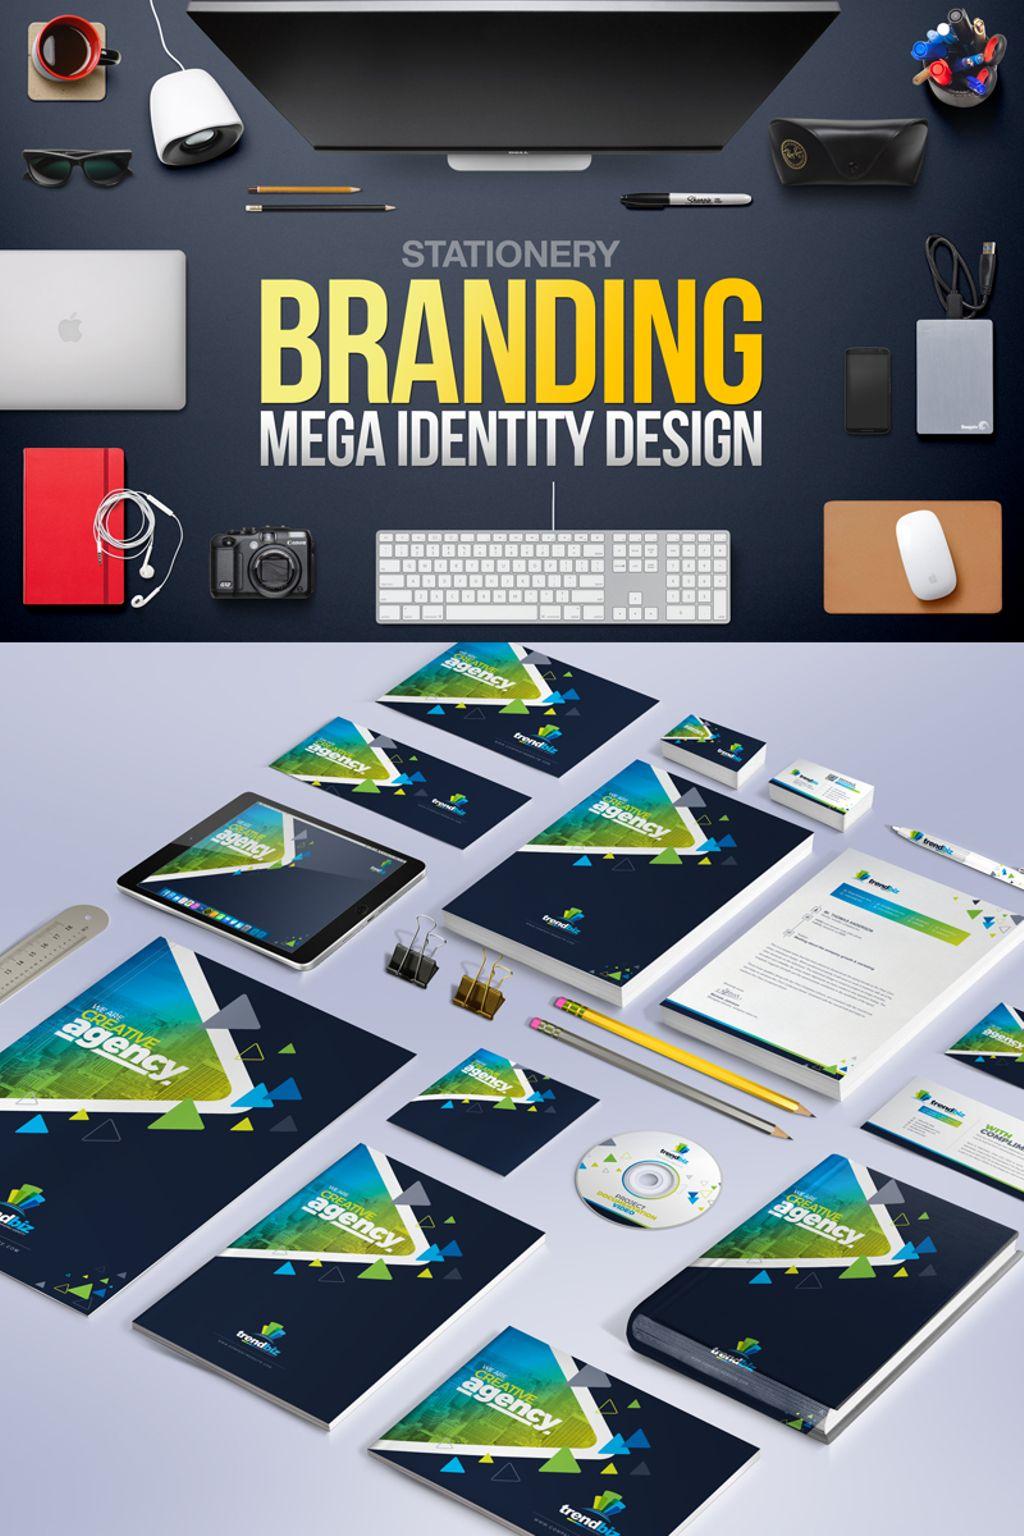 Stationery Branding Mega Identity Design Corporate identity-mall #67294